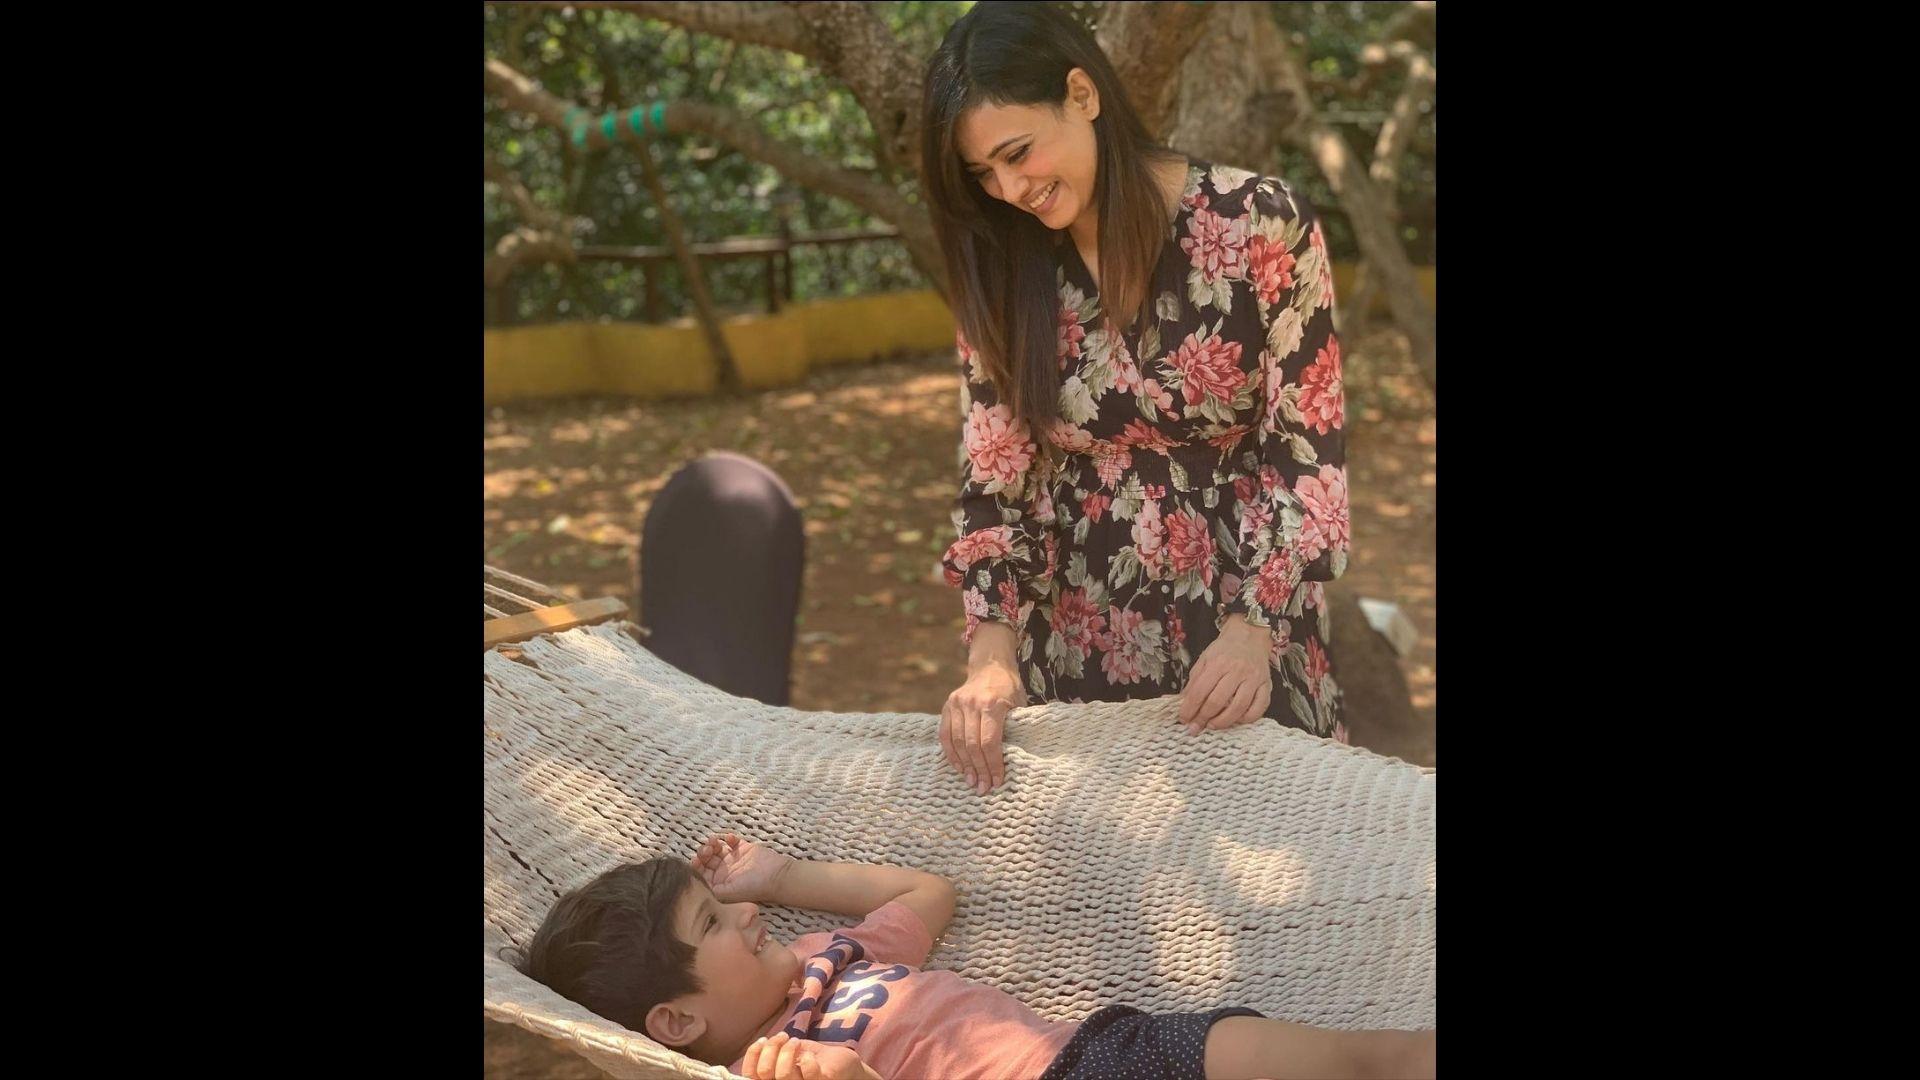 Shweta Tiwari Makes A Fashion Splash At The Airport As She Heads To Goa With Her Son Reyansh Kohli